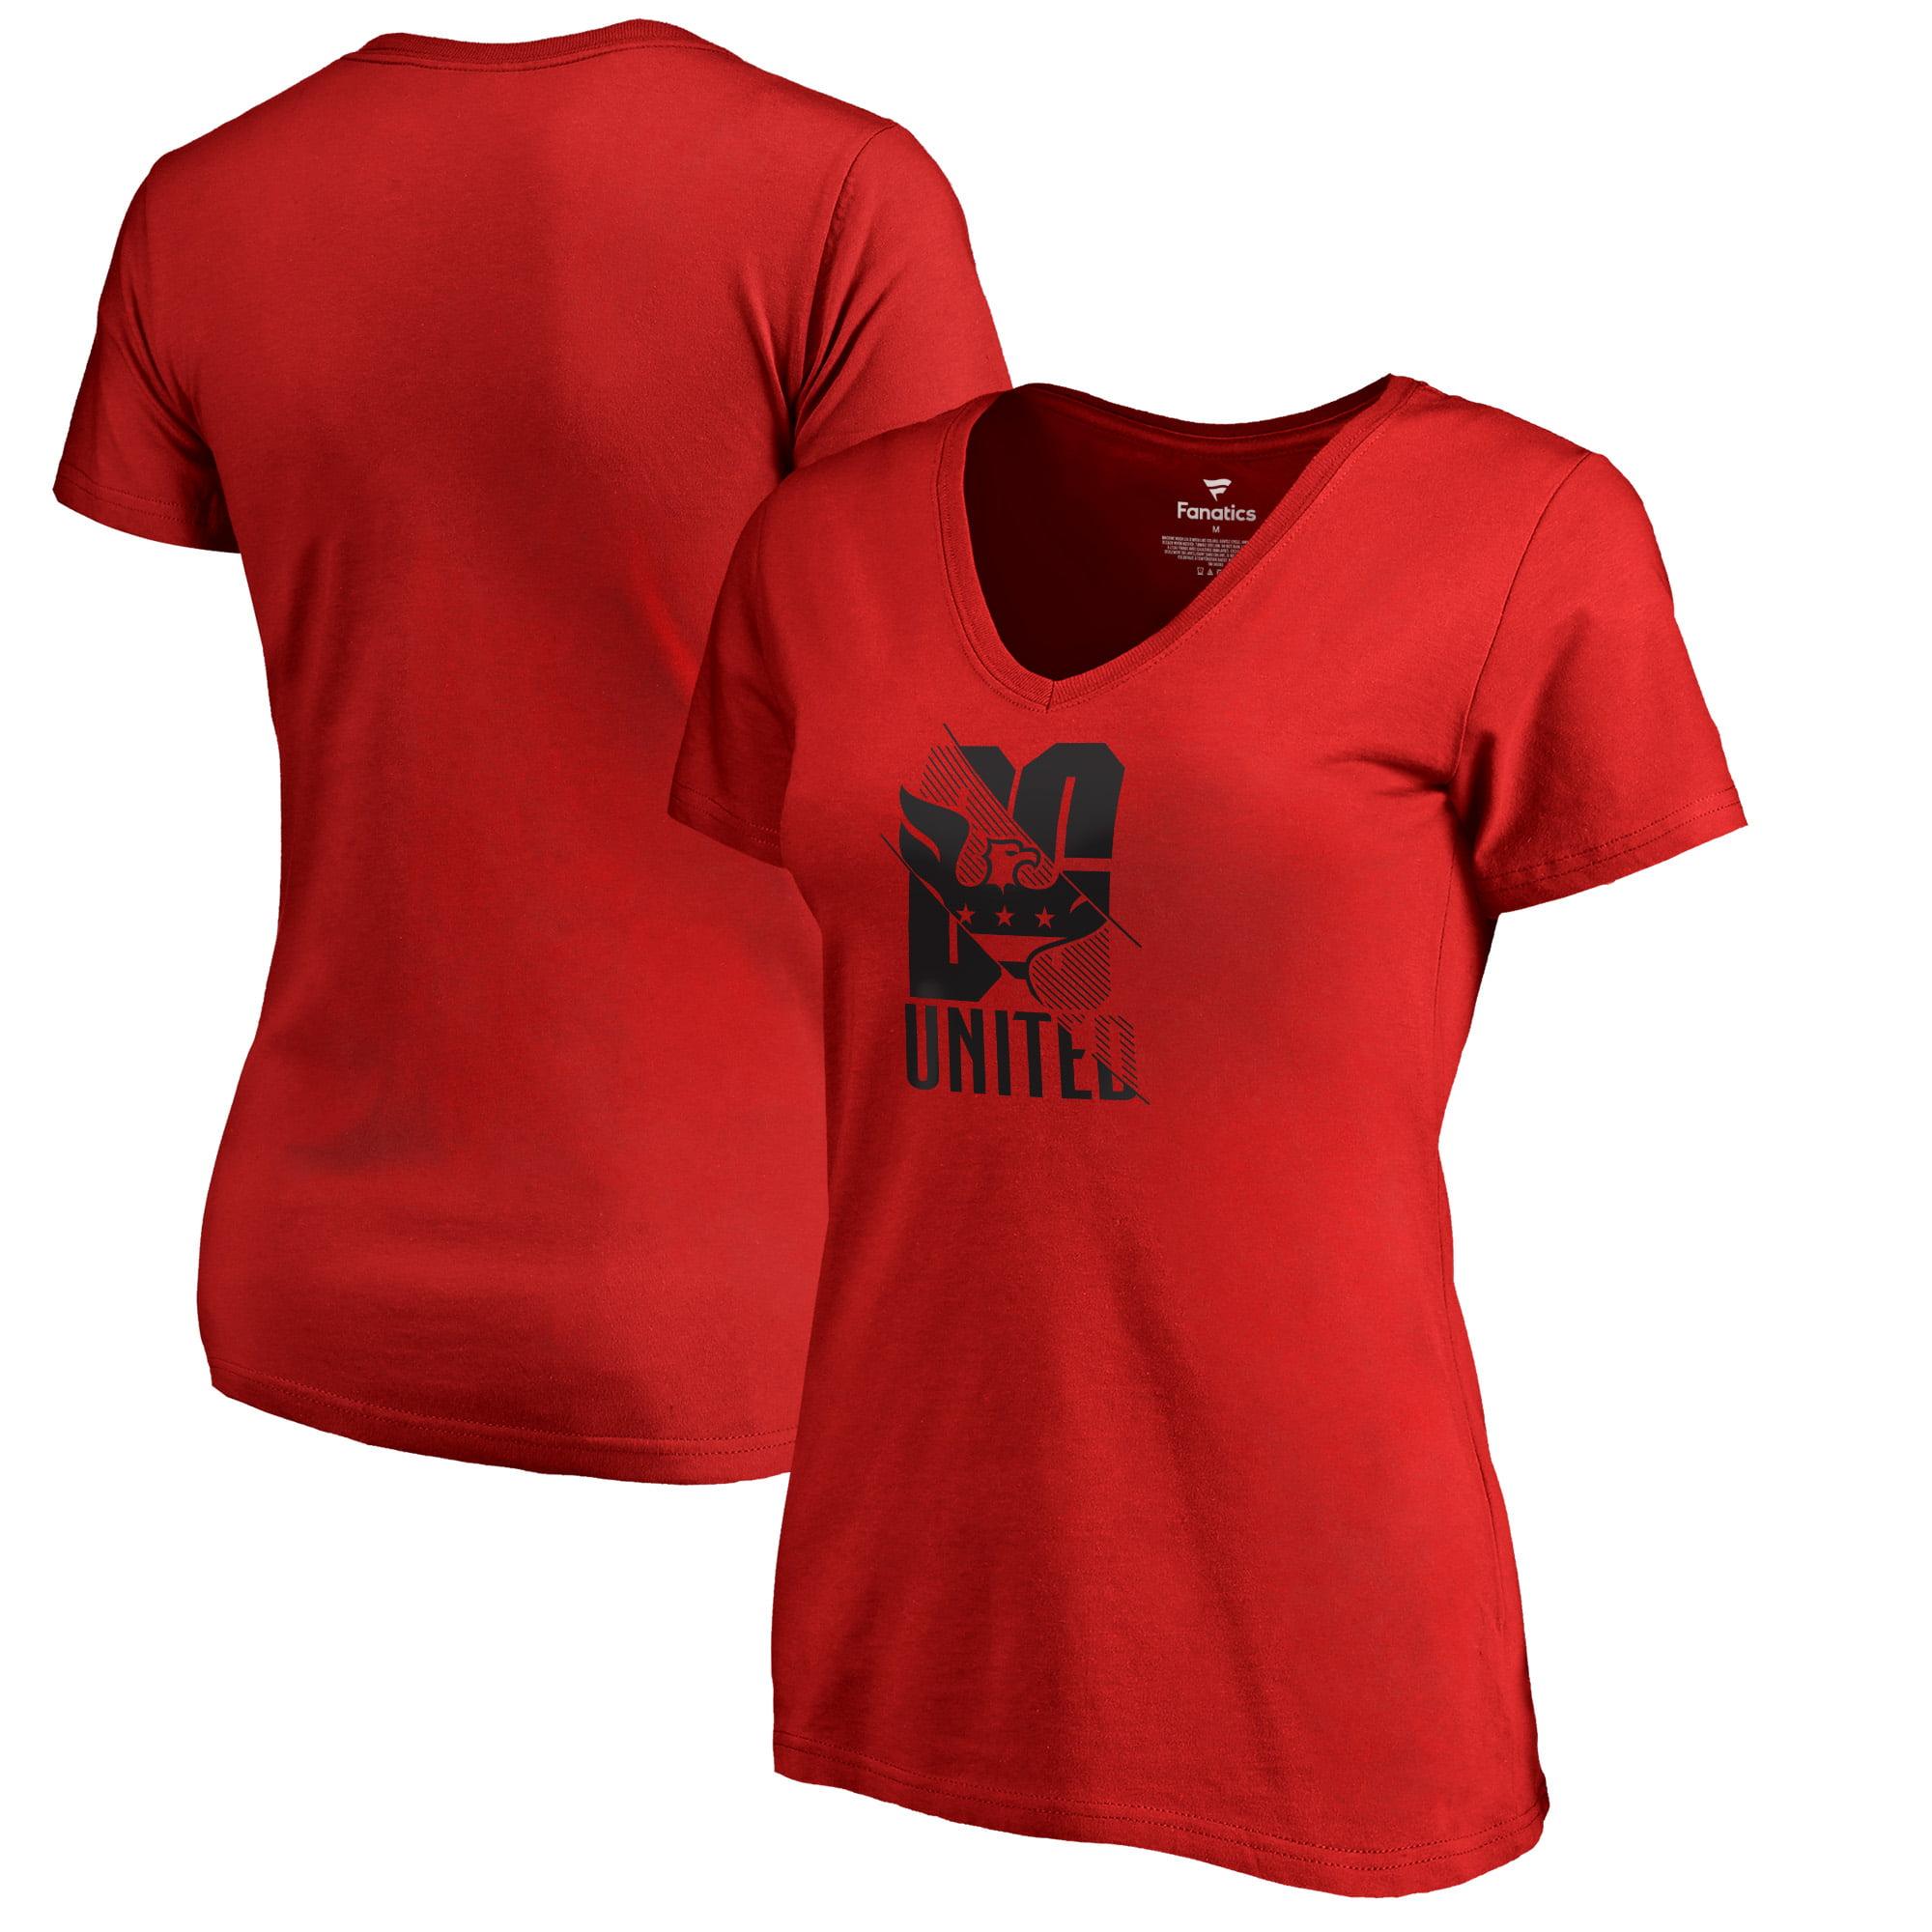 D.C. United Fanatics Branded Women's League Trend V-Neck T-Shirt - Red